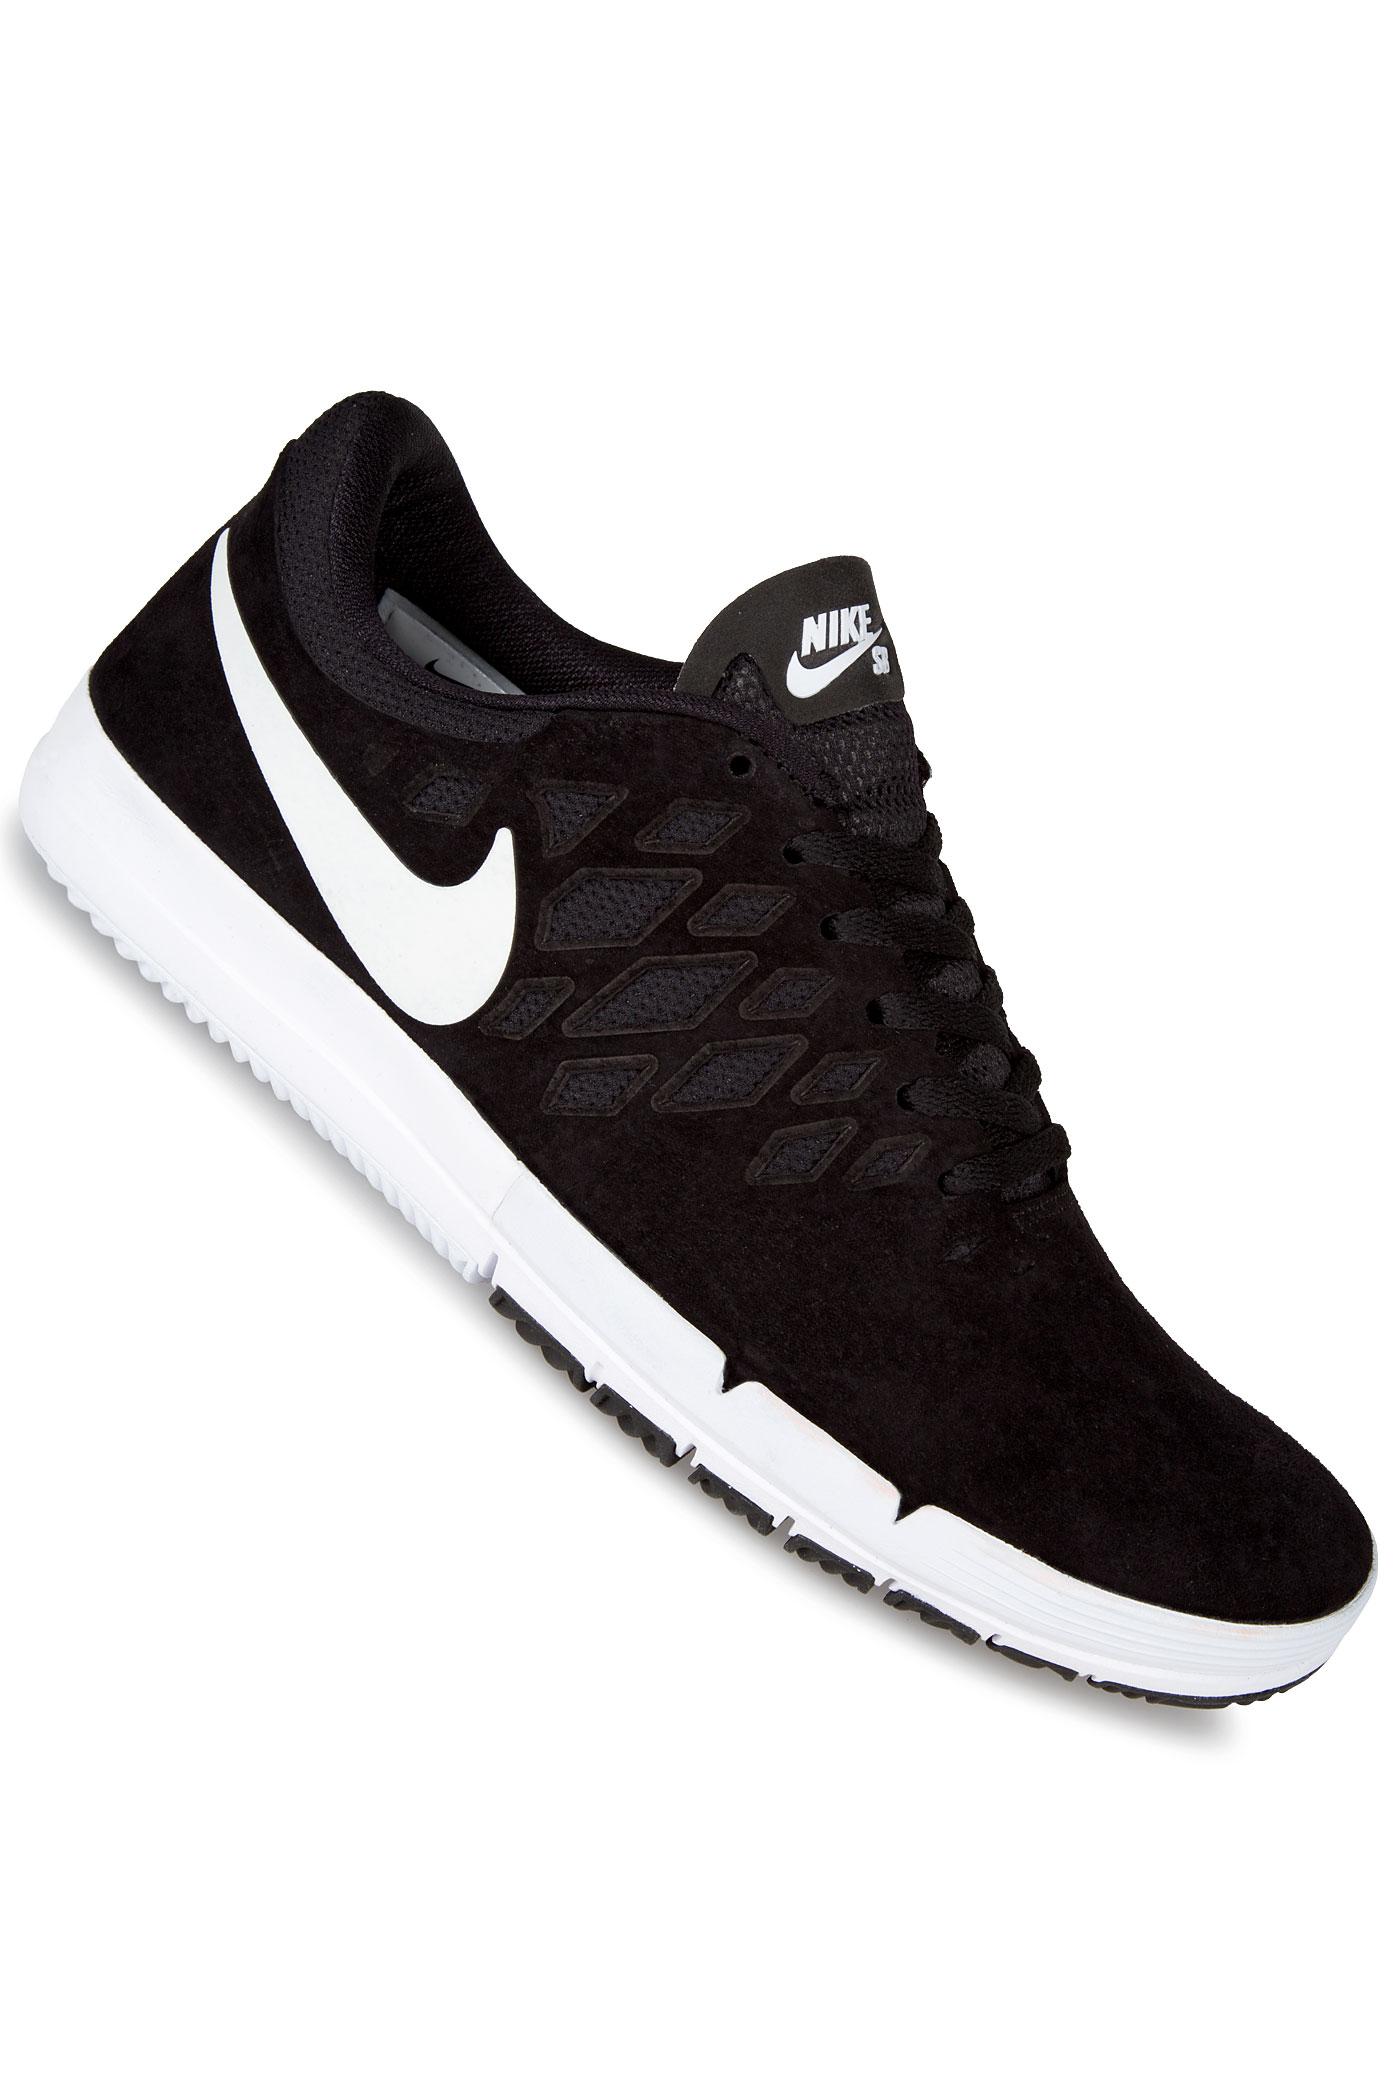 nike sb free chaussure black white black achetez sur skatedeluxe. Black Bedroom Furniture Sets. Home Design Ideas